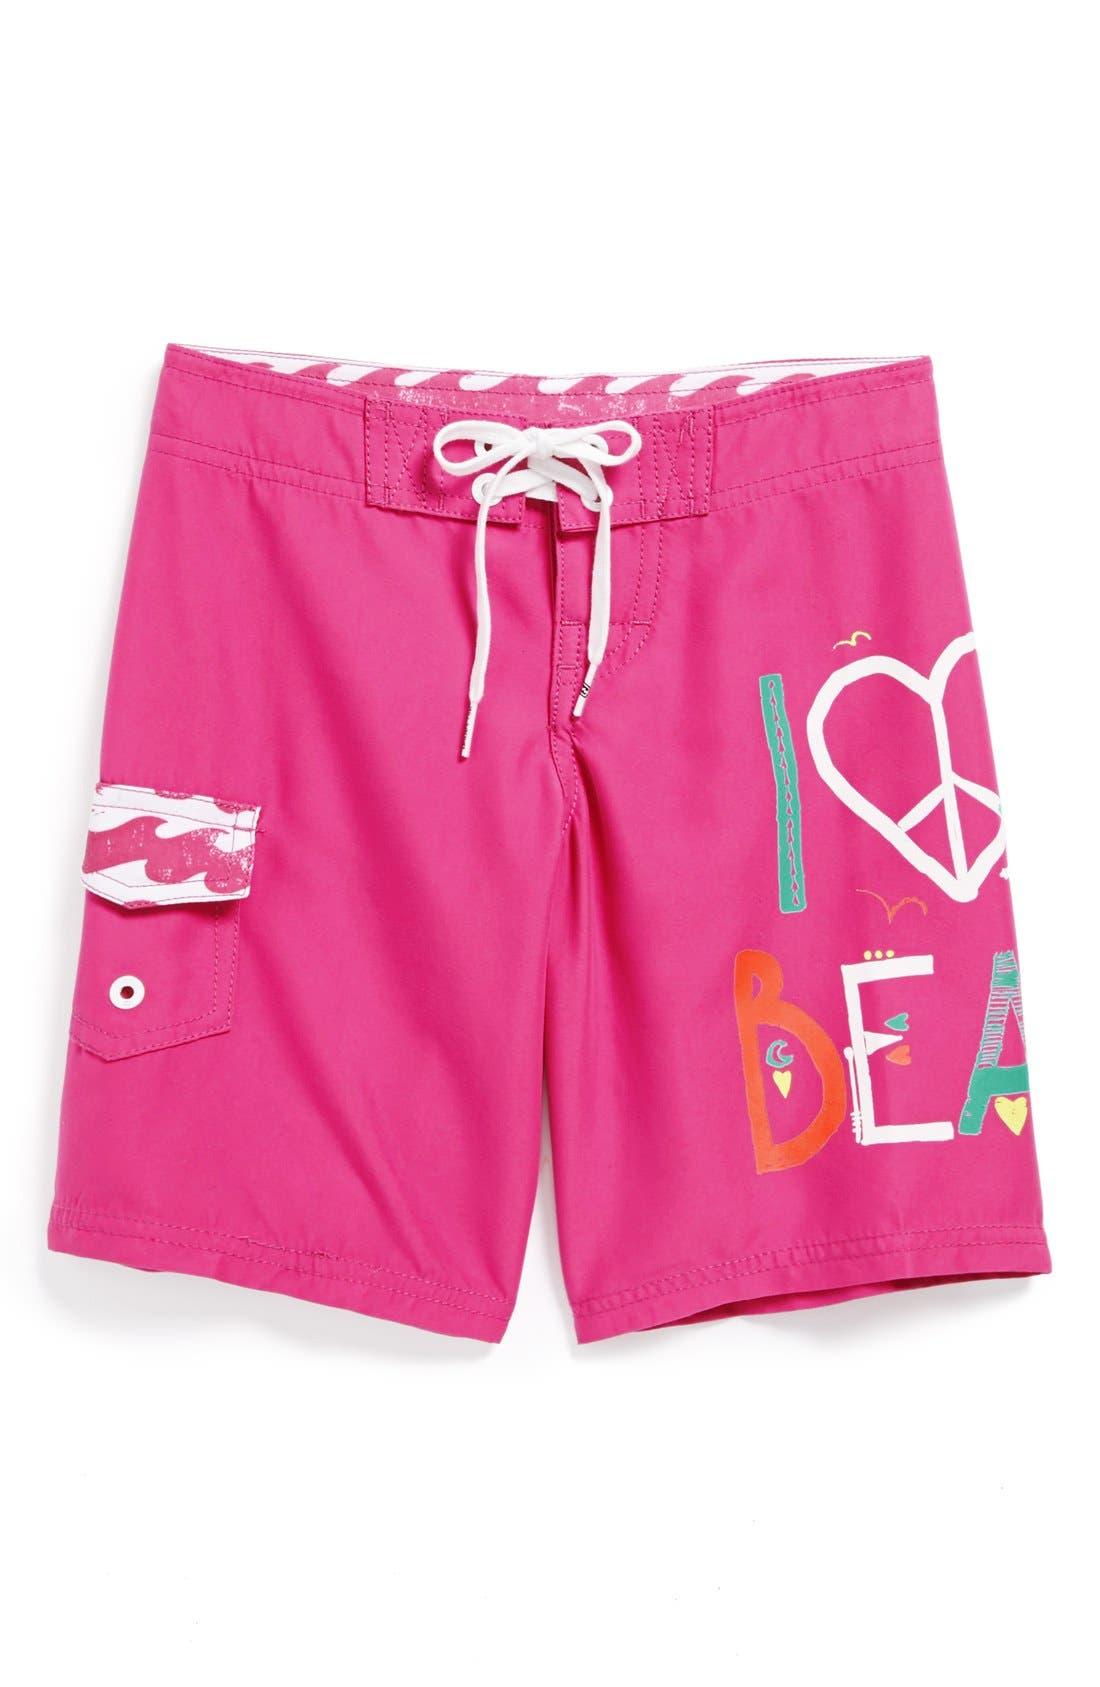 Alternate Image 1 Selected - Billabong 'I Love the Beach' Board Shorts (Big Girls)